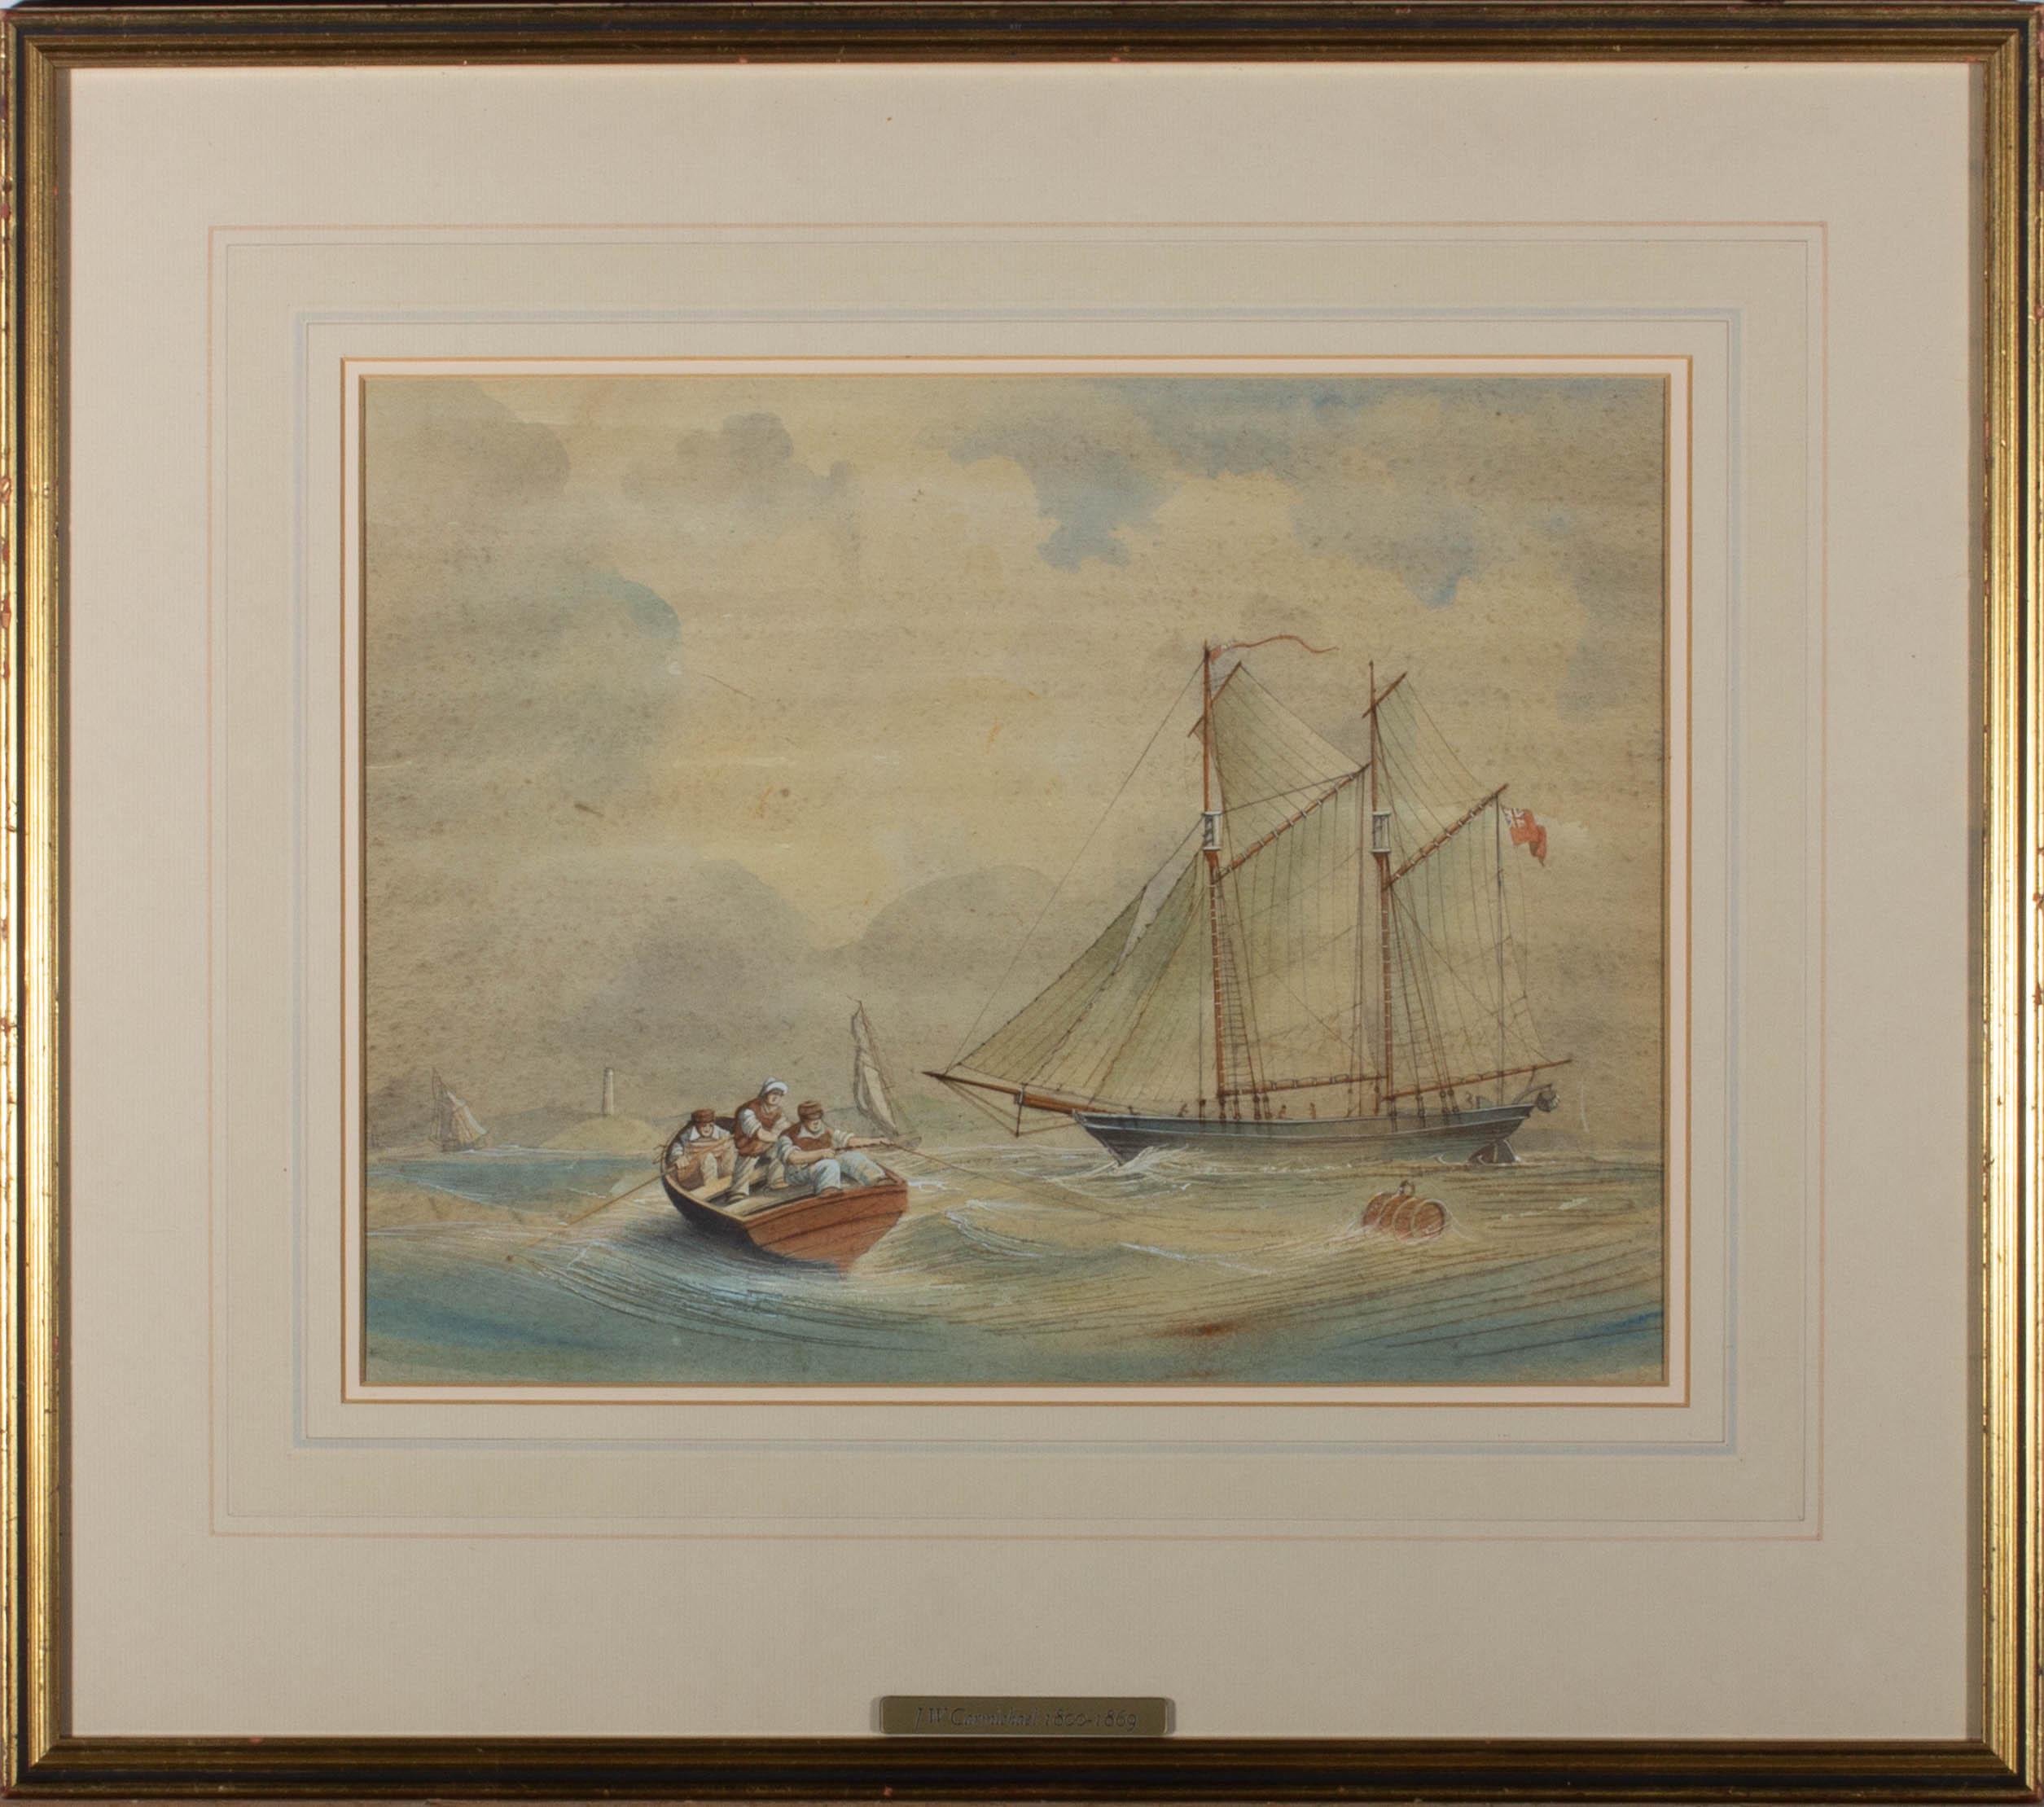 Follower of J.W. Carmichael (1800-1868) - Early 19th Century Watercolour, Ketch